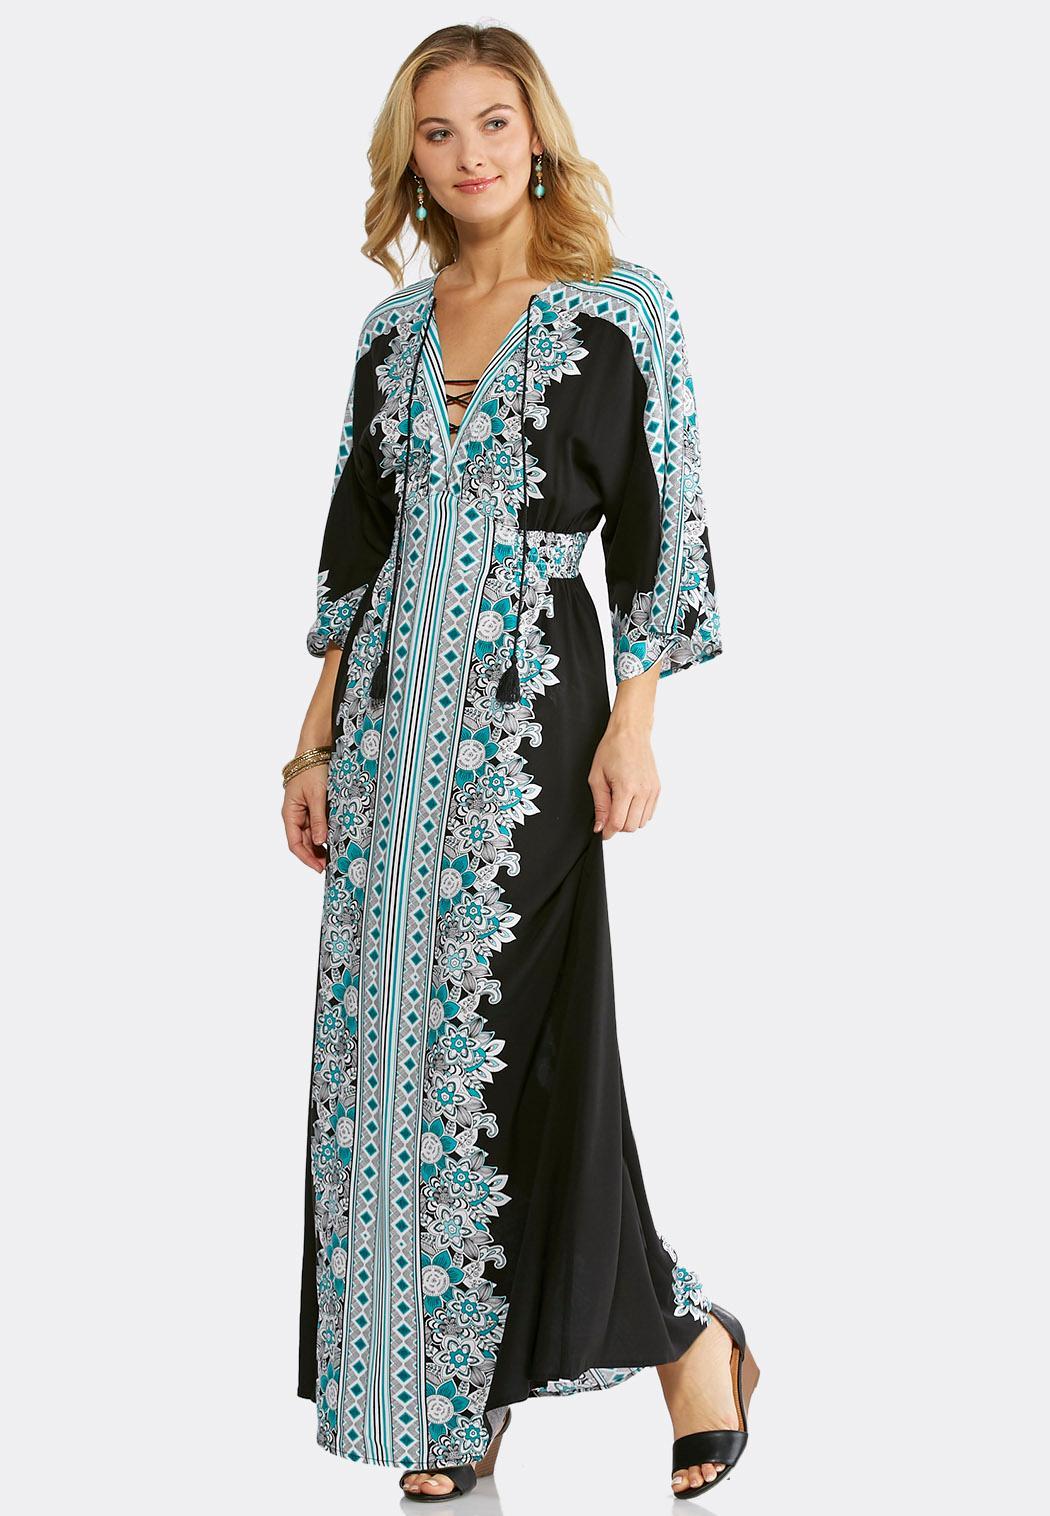 Kimono sleeve dress images